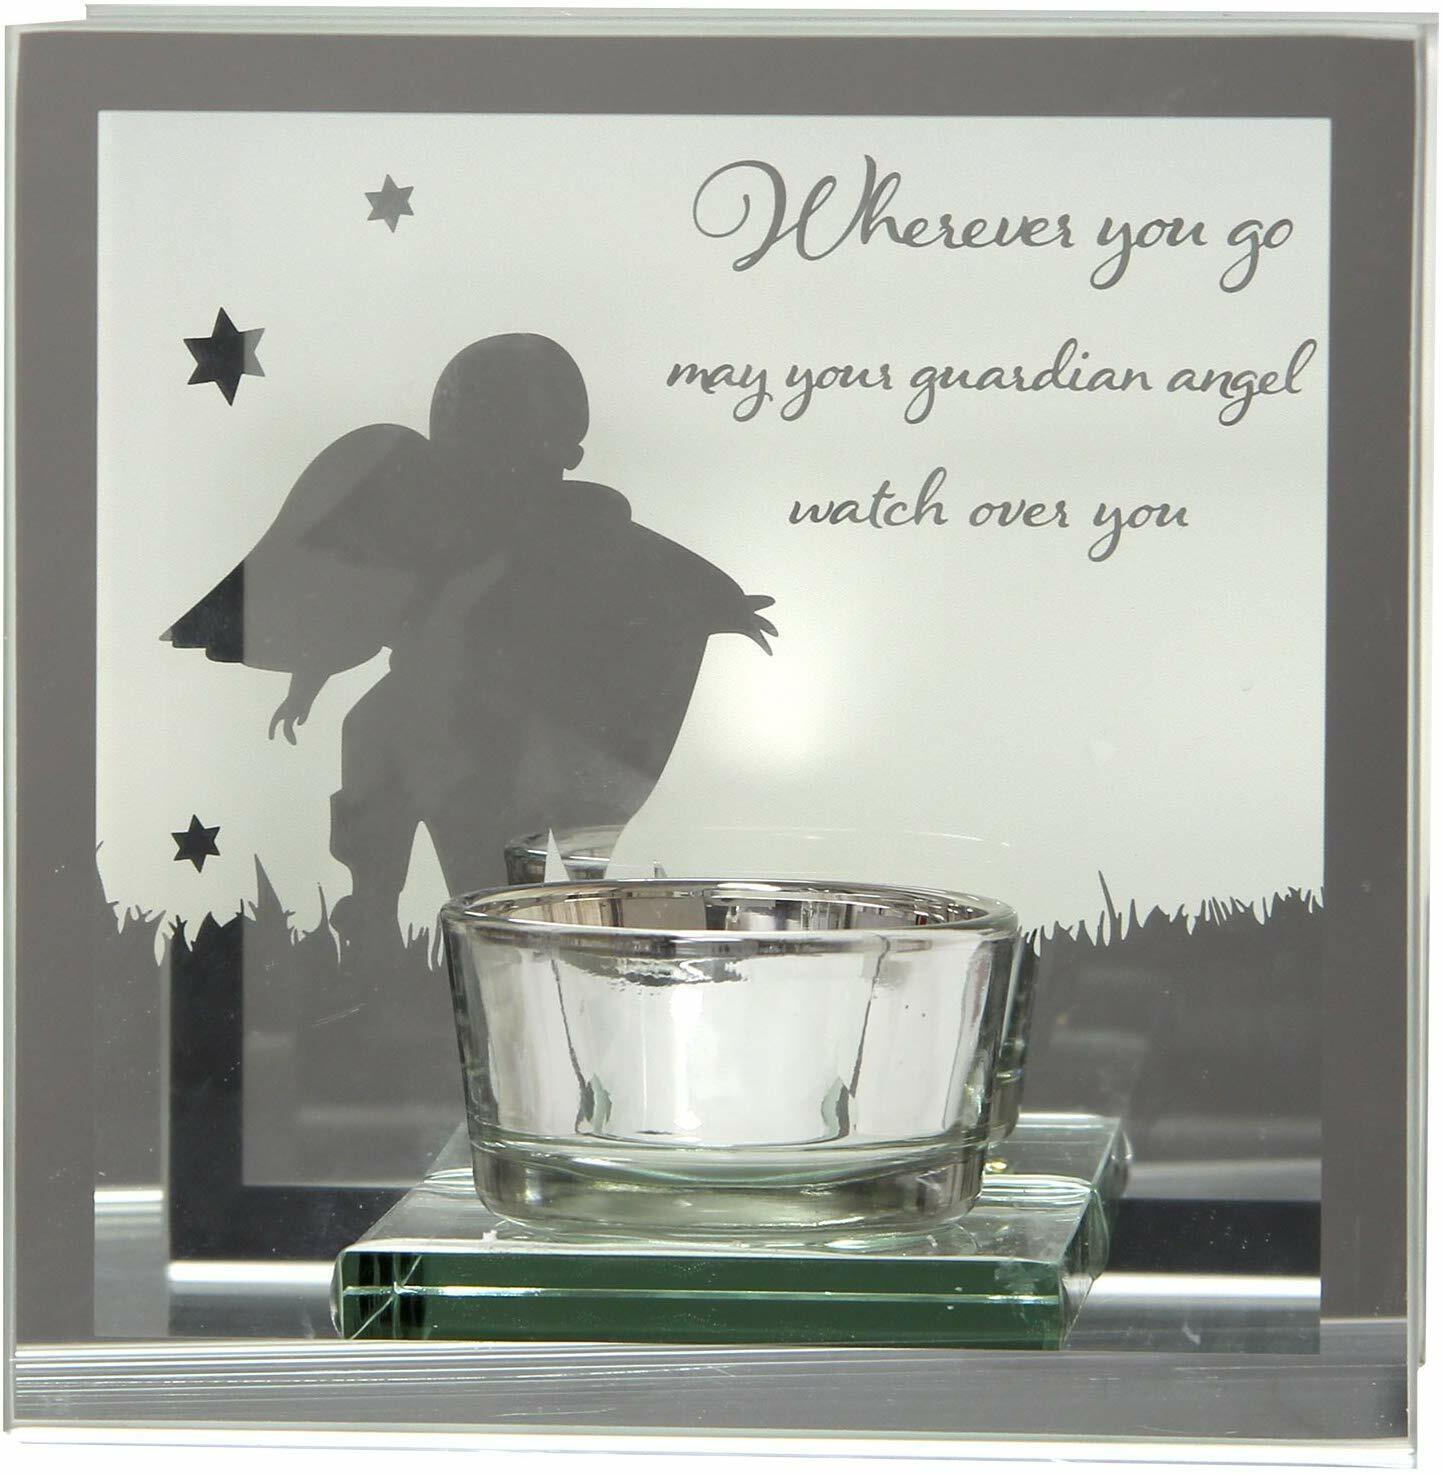 Glass Mirrored Guard Angel Tea Light Holder Plaque Ornament Christmas Gift New